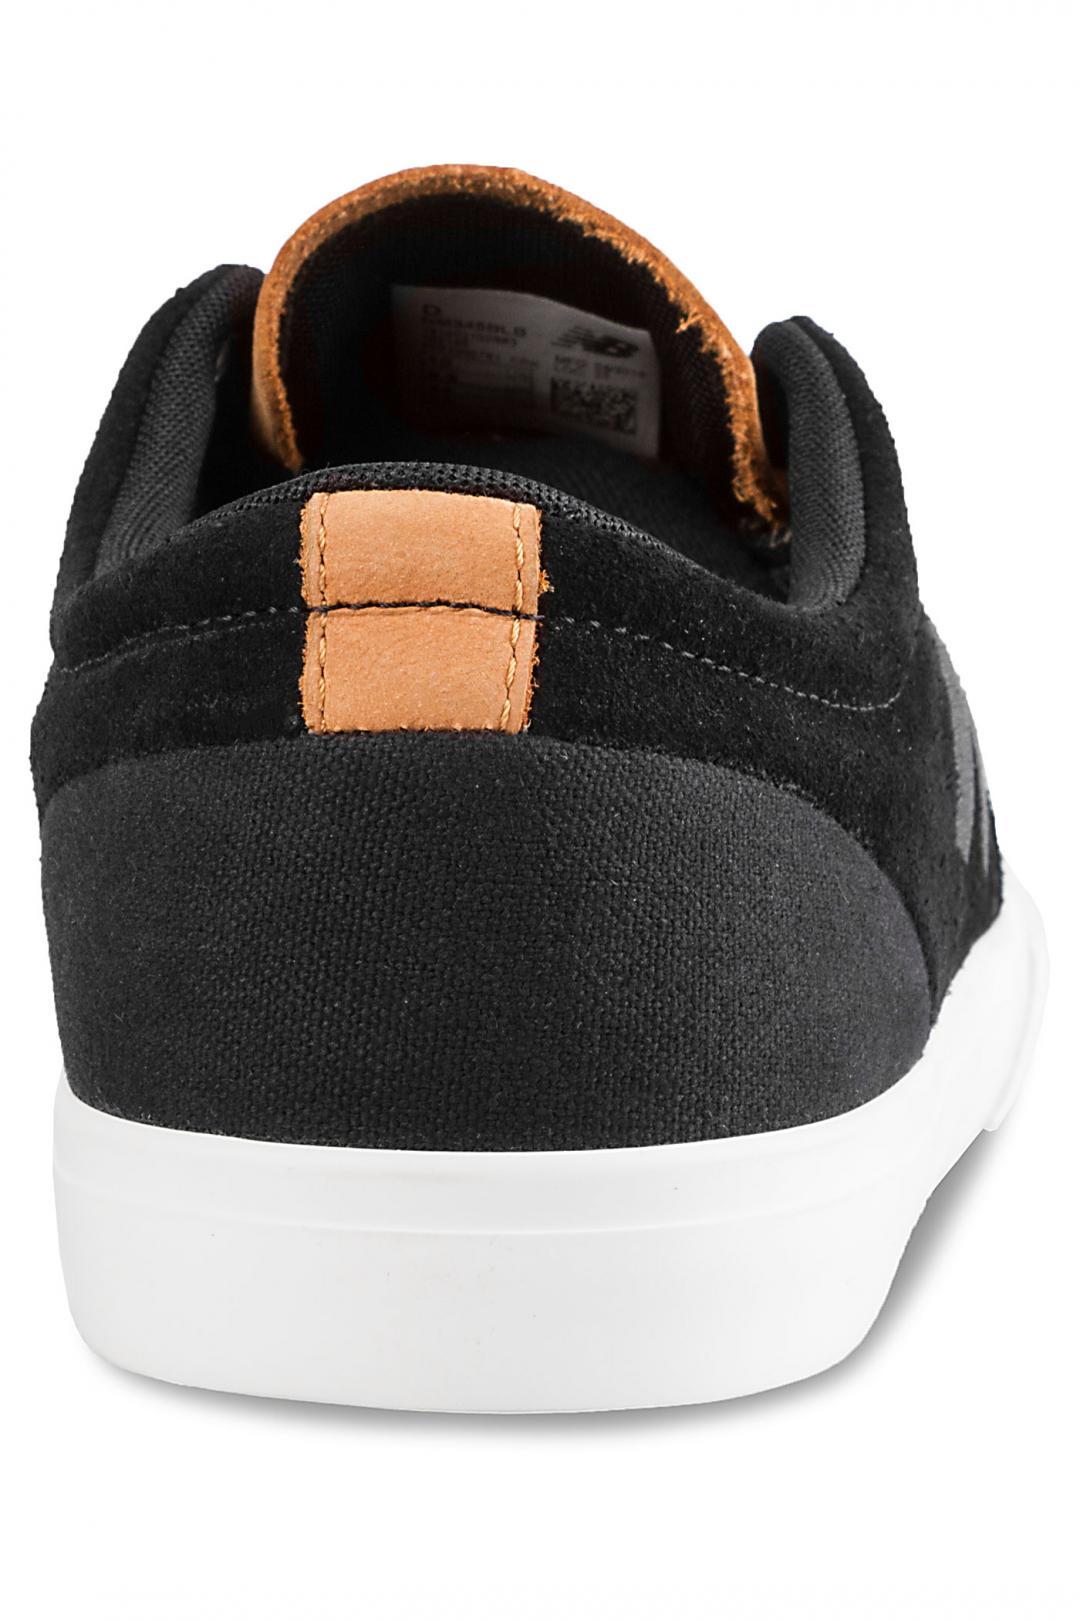 Uomo New Balance Numeric 345 black white brown | Sneaker